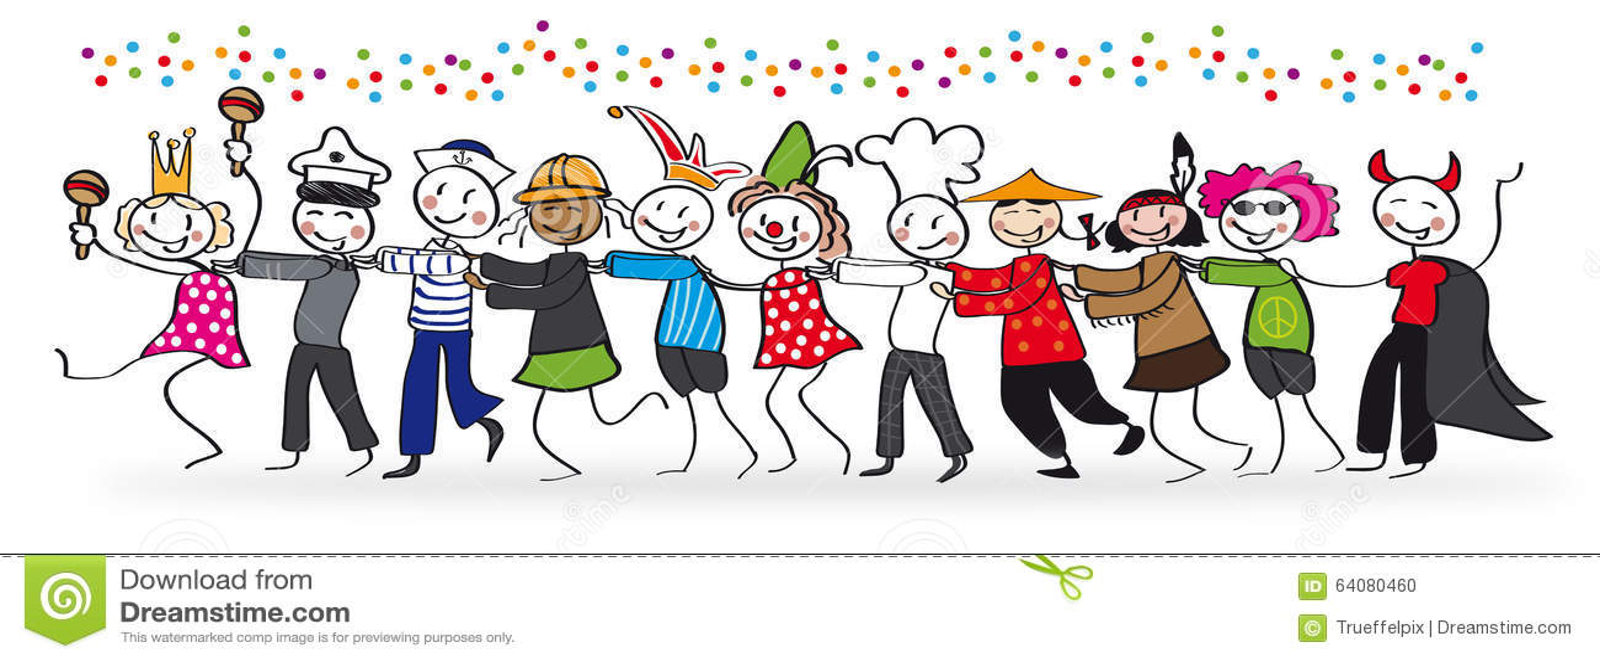 Folk som firar karneval